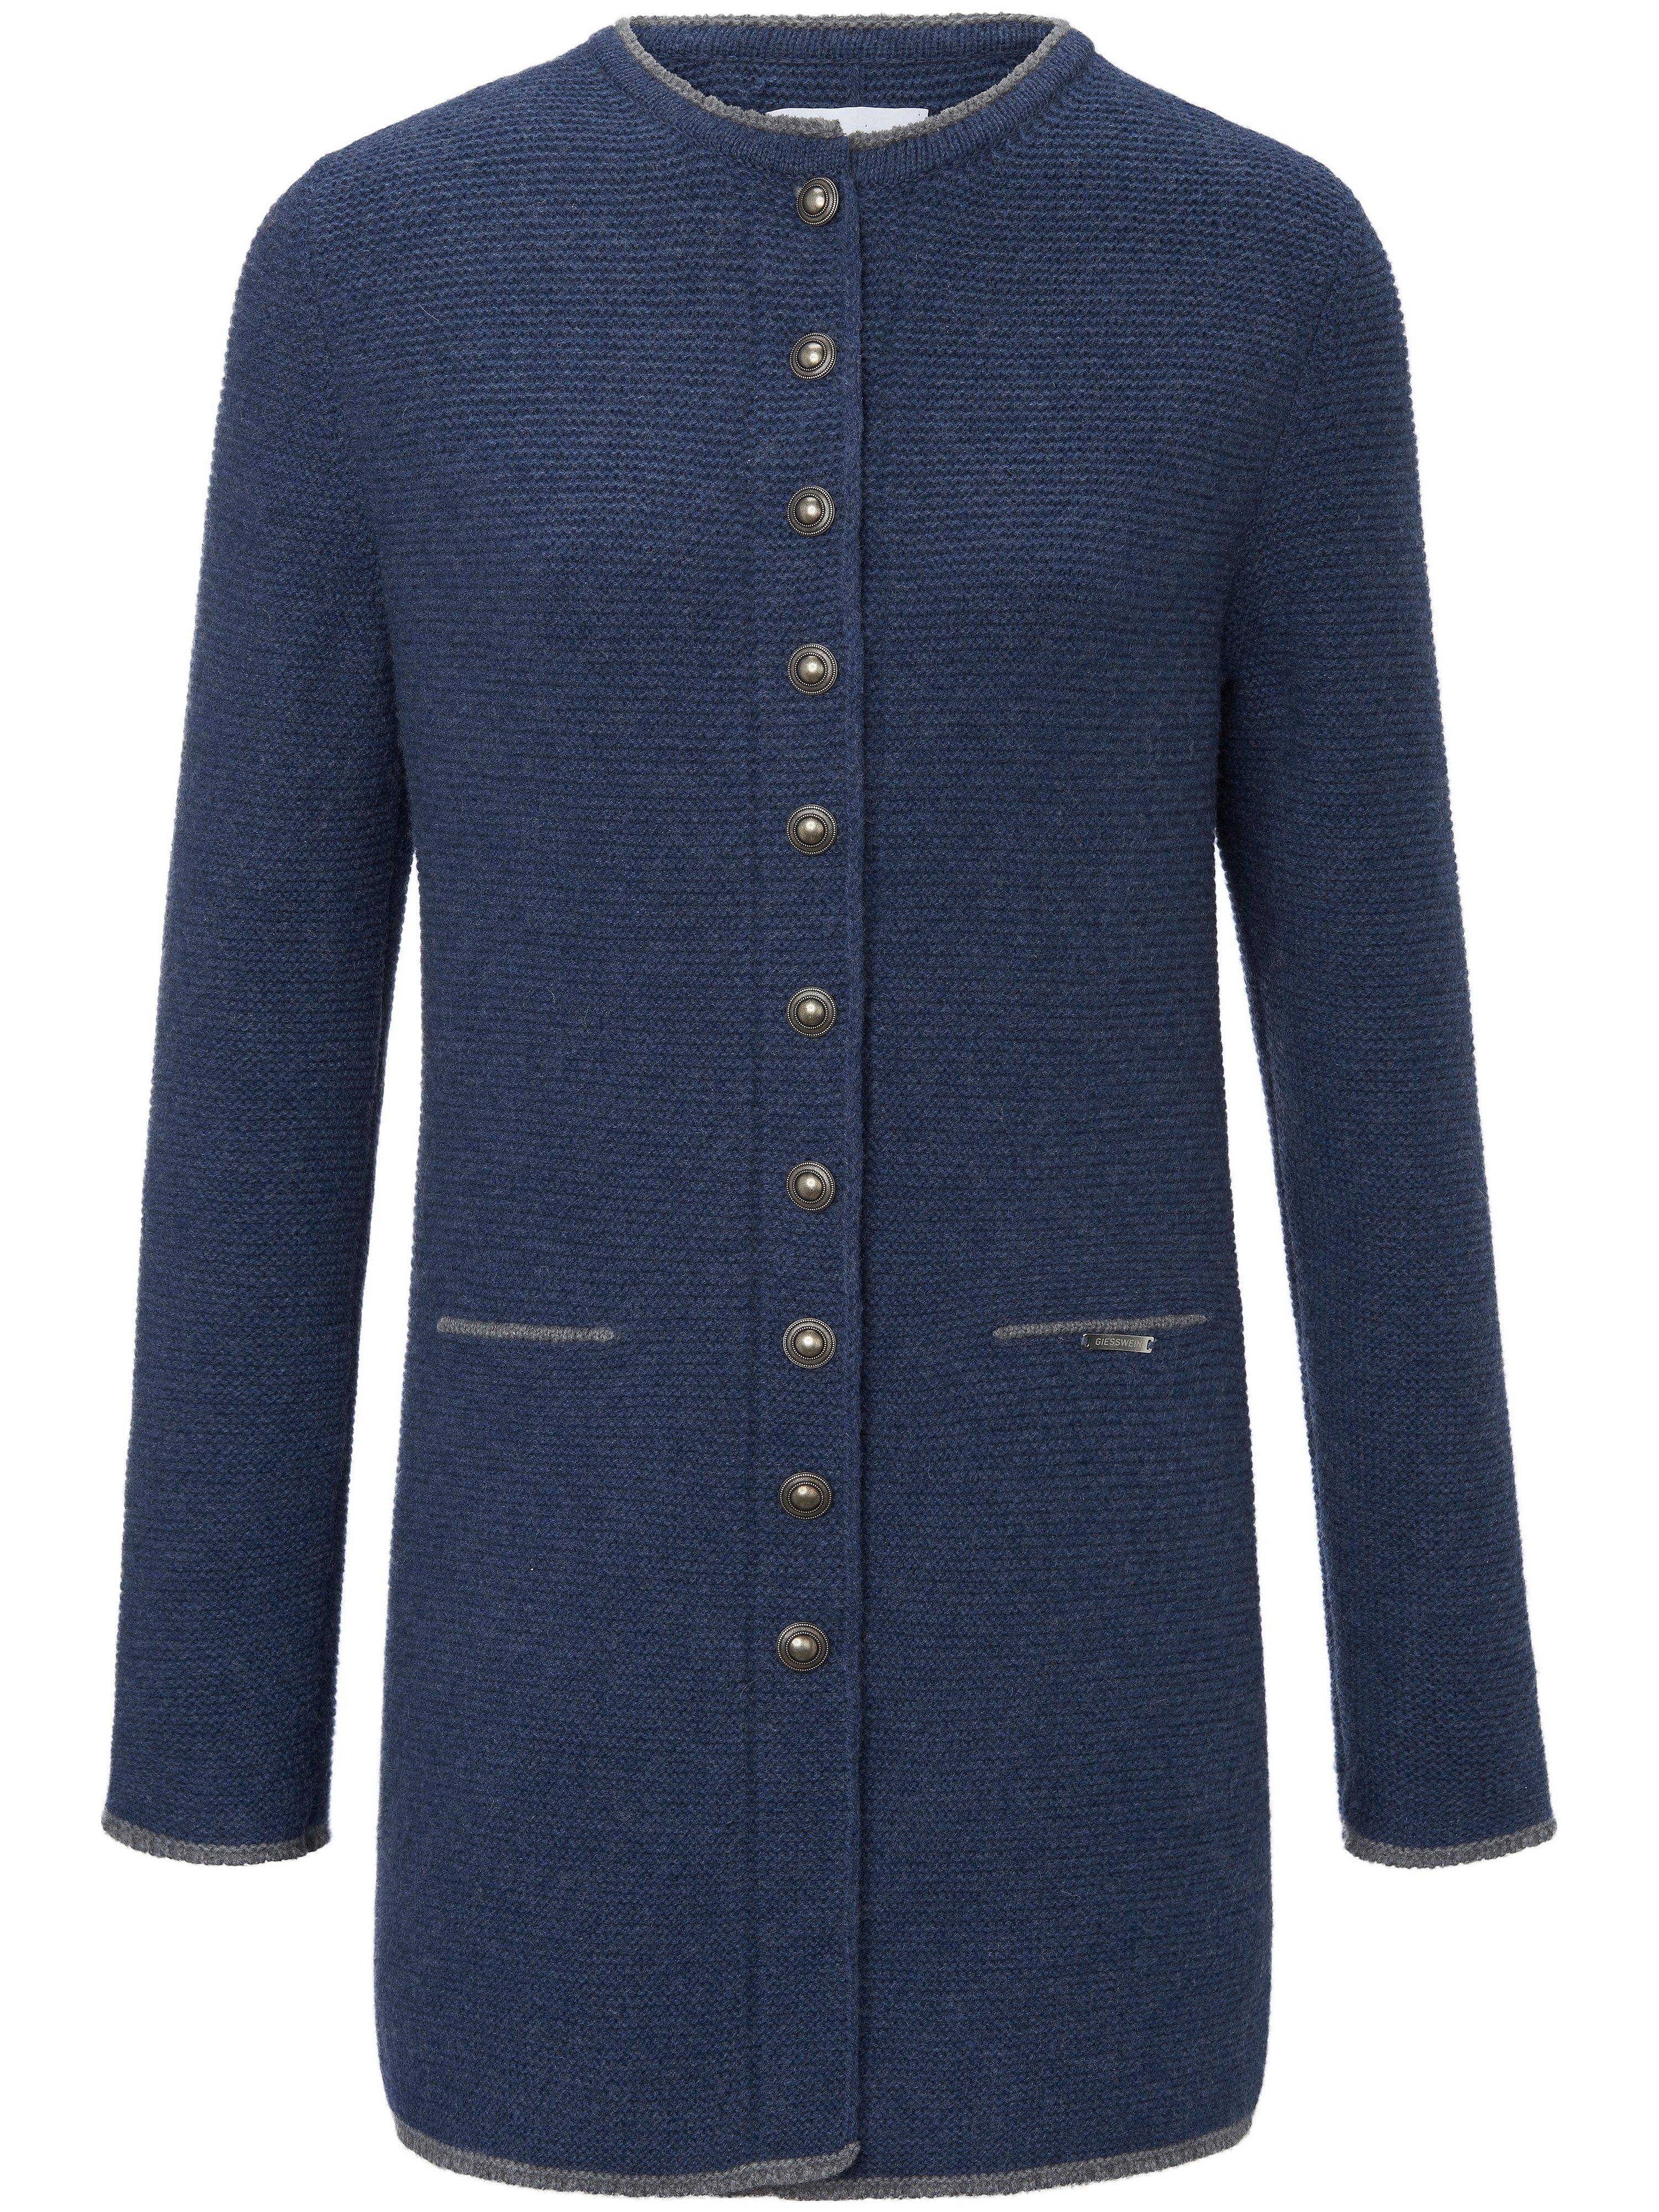 La redingote Lotte 100% laine vierge  Giesswein bleu taille 52